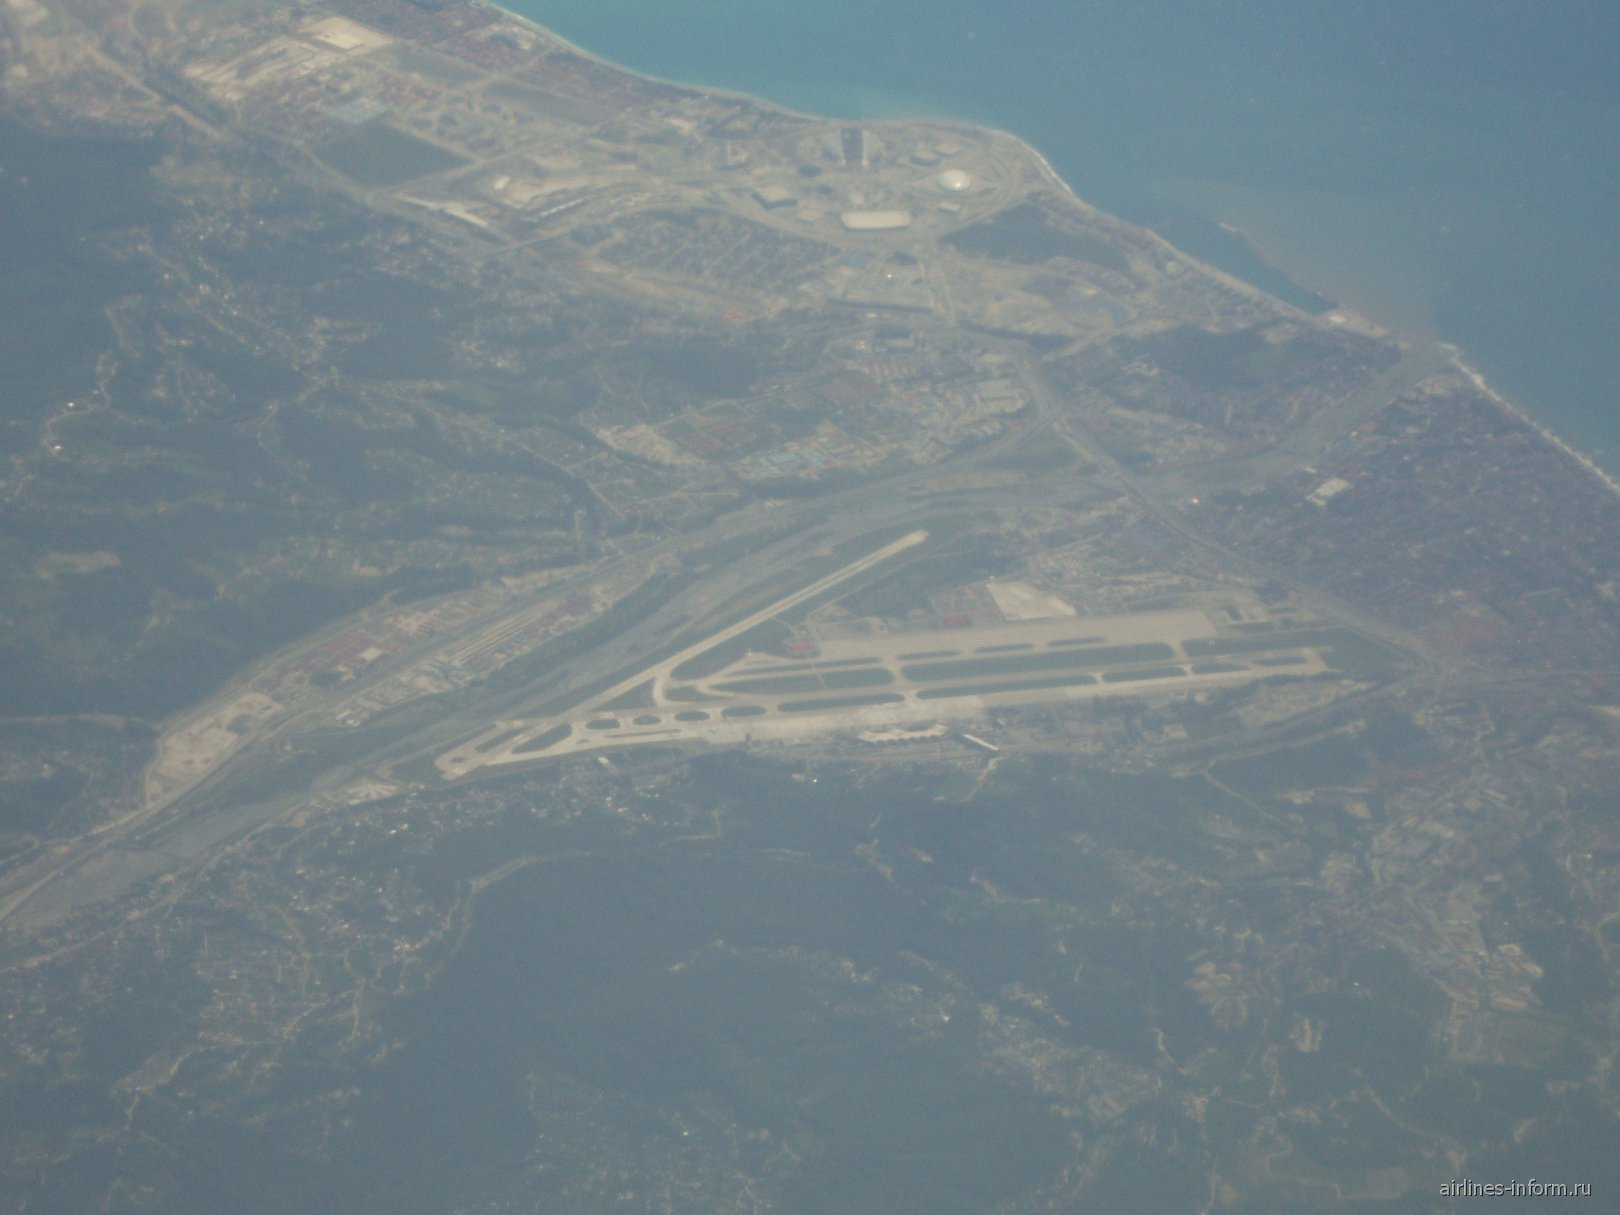 Вид из самолета на аэропорт Сочи